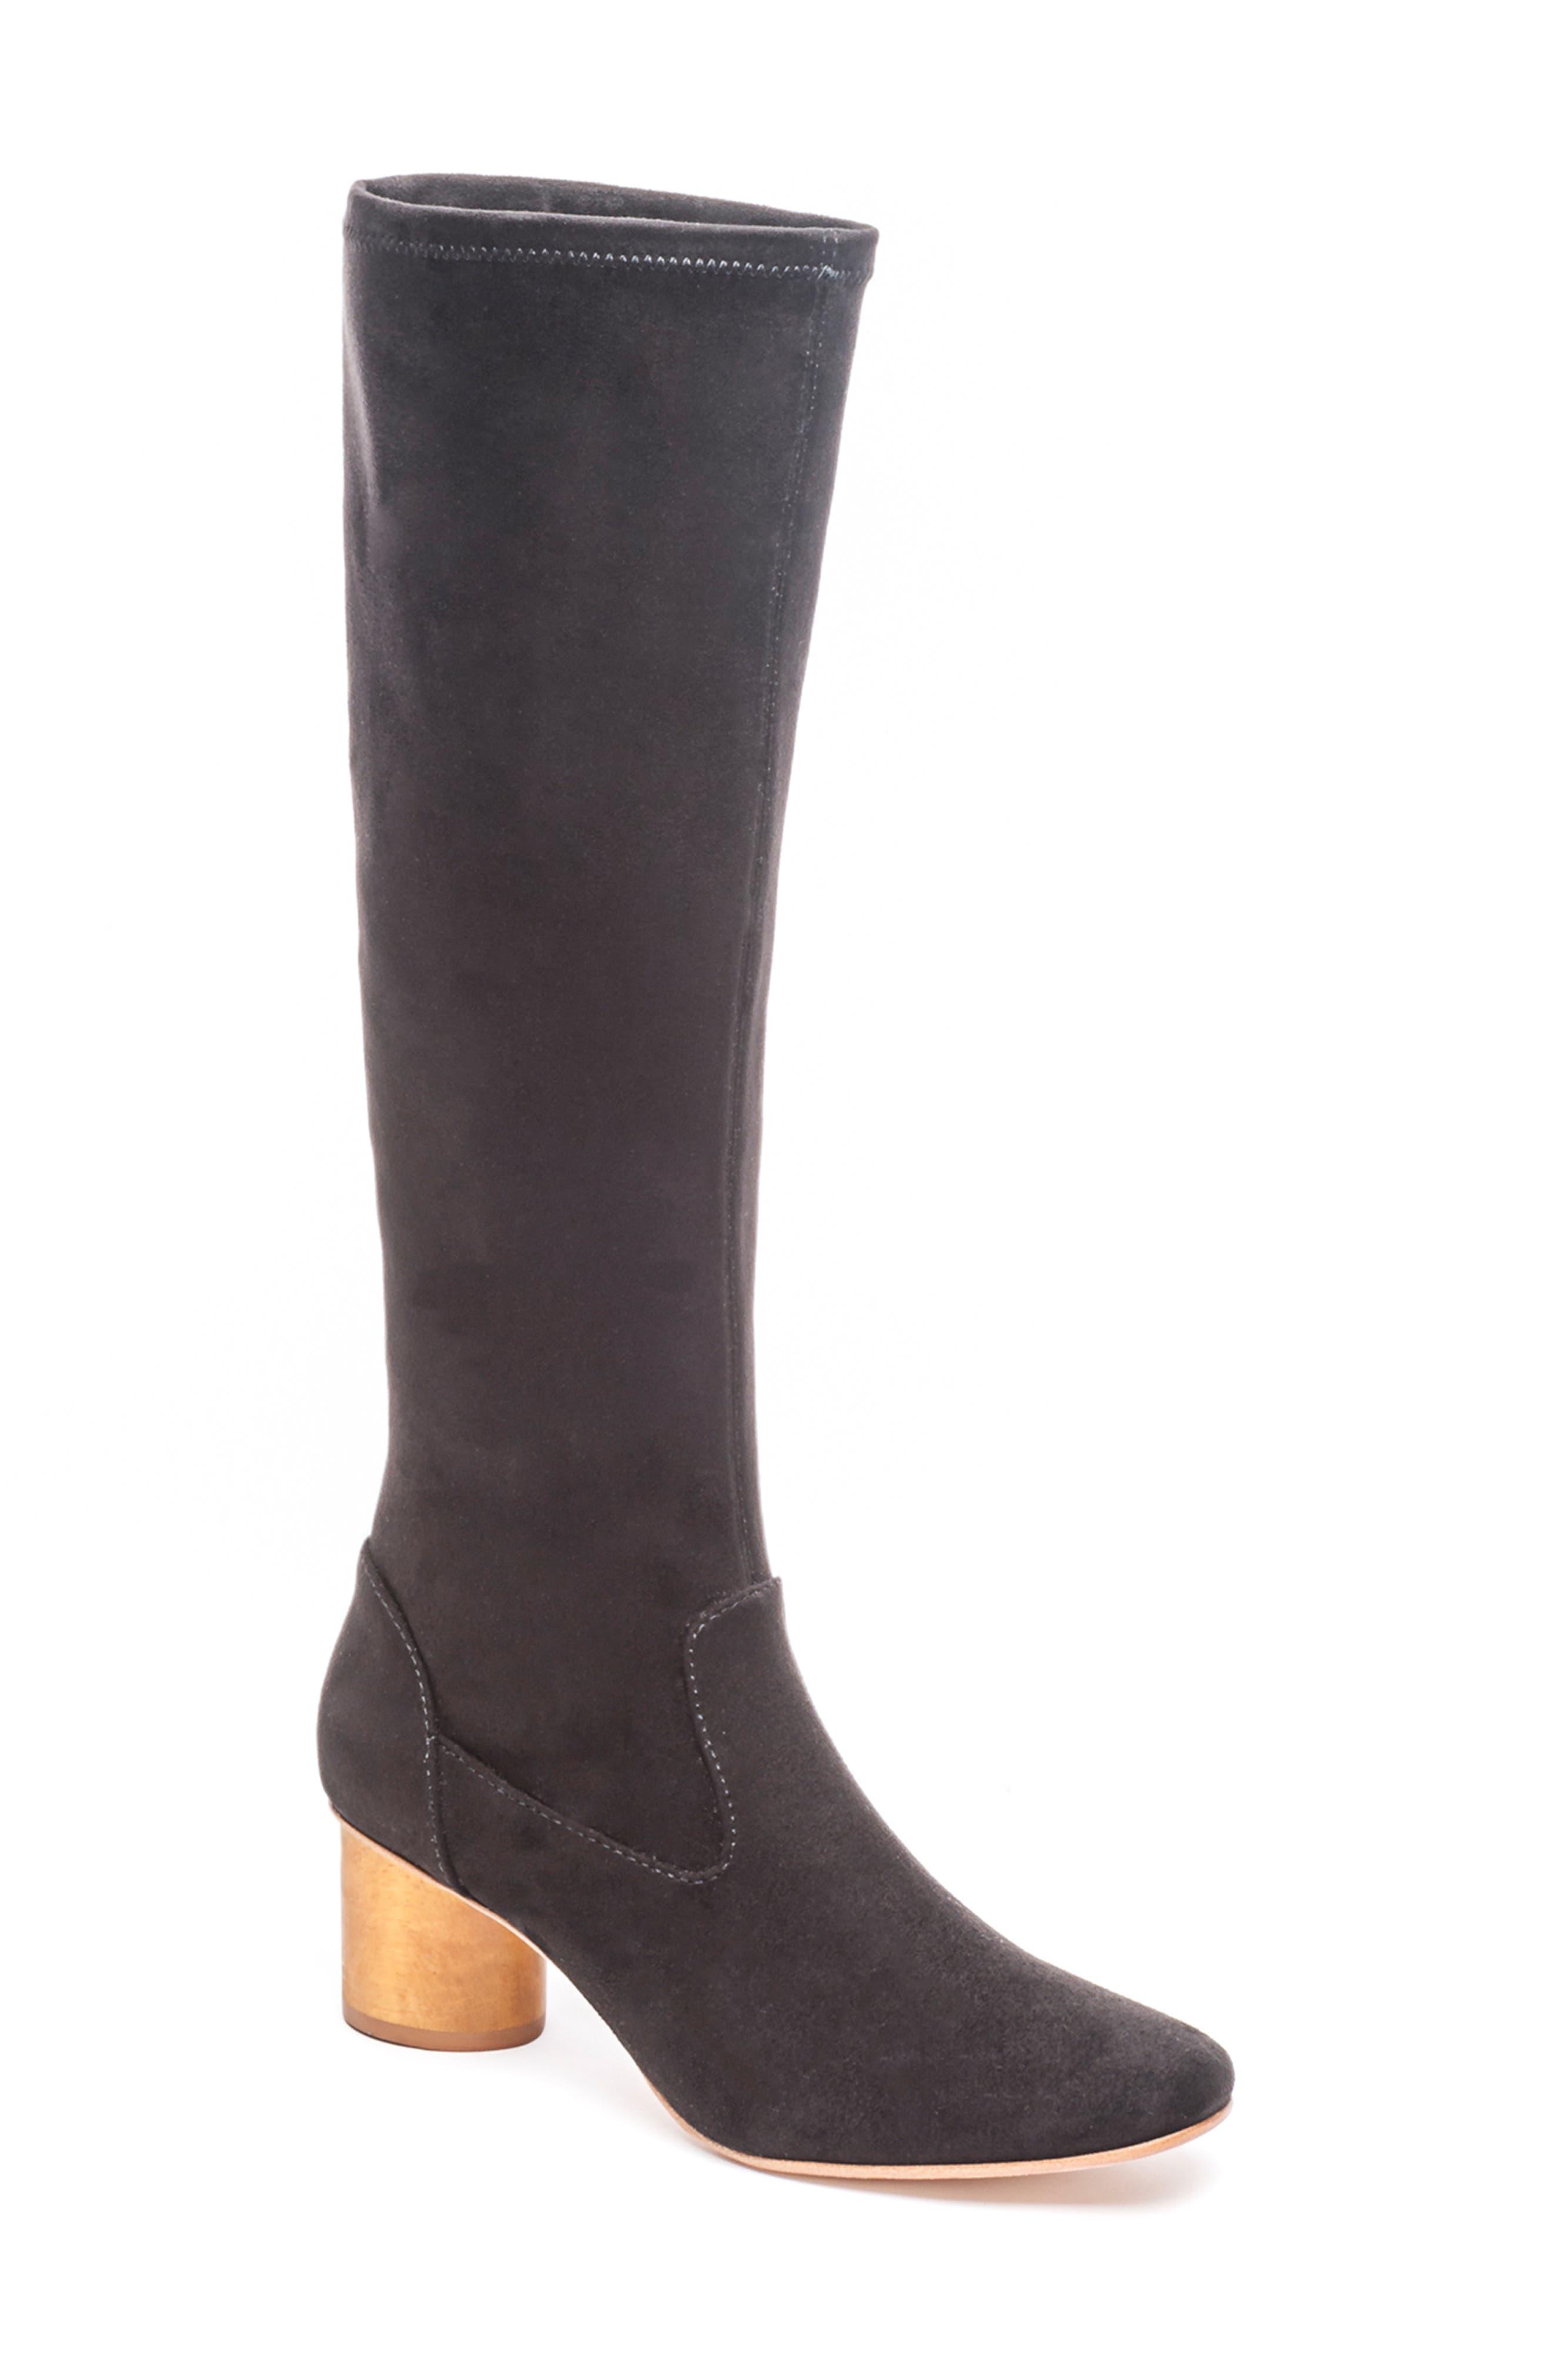 BERNARDO, Knee High Boot, Main thumbnail 1, color, BLACK LEATHER